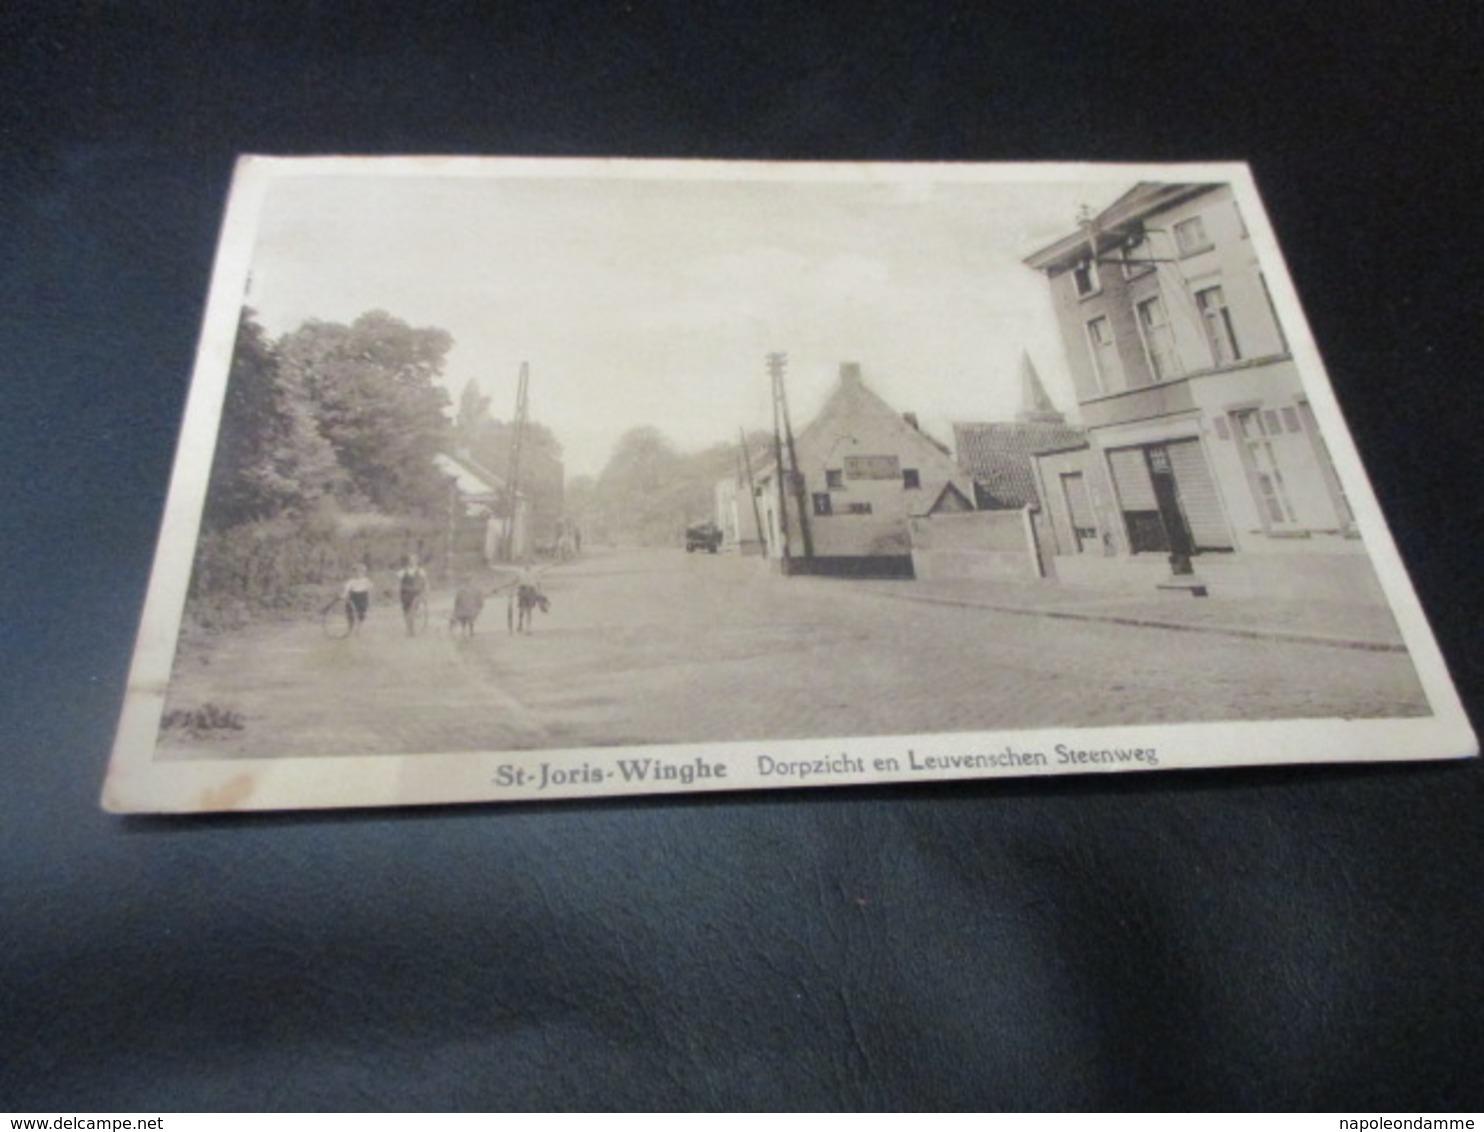 St Joris Winge, Dorpzicht En Leuvensesteenweg - Tielt-Winge